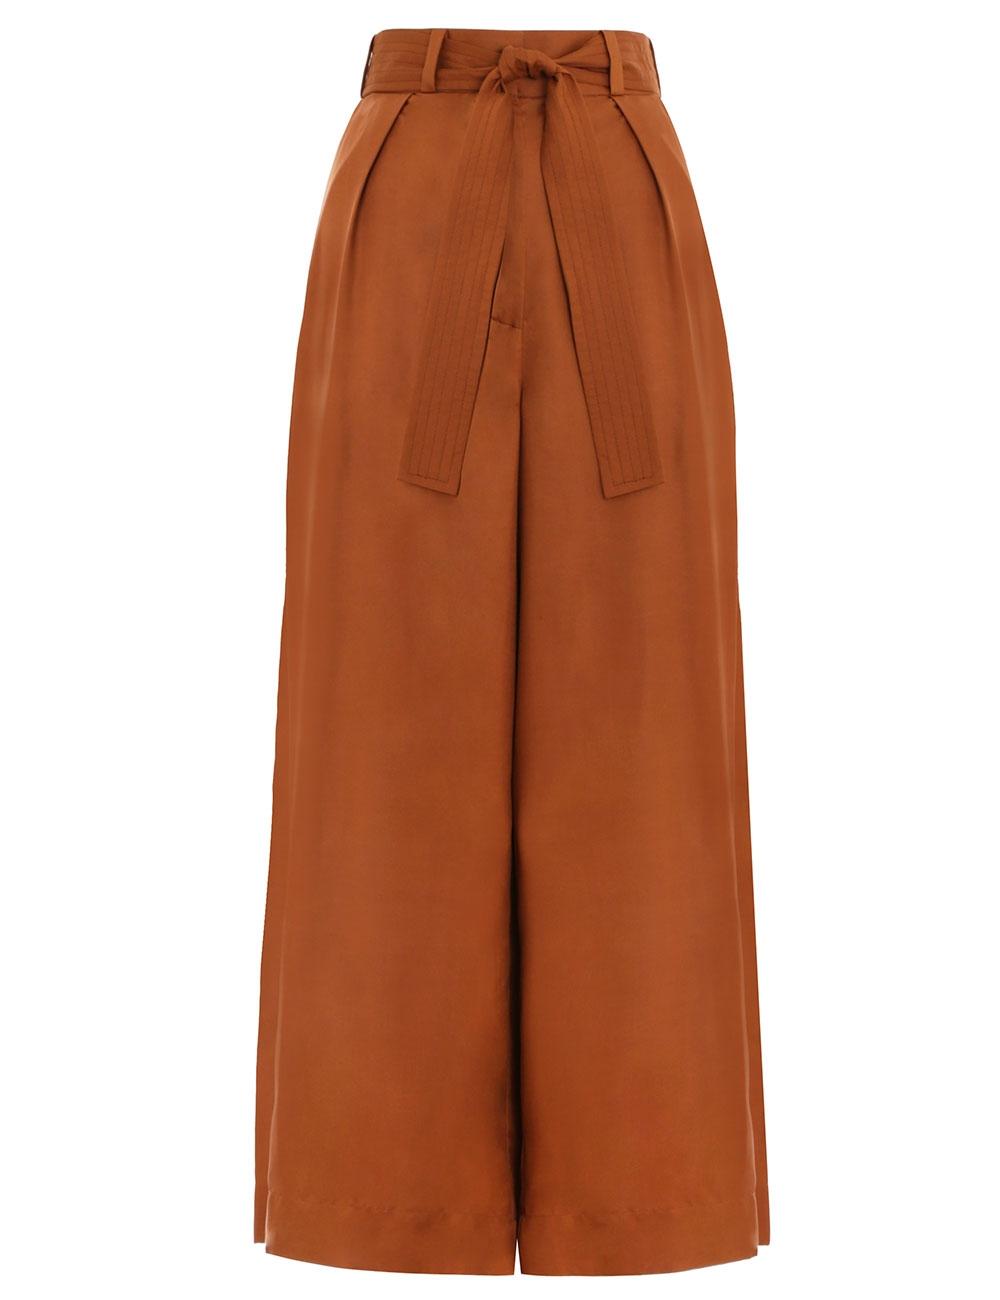 Ninety-Six Tuck Crop Pant